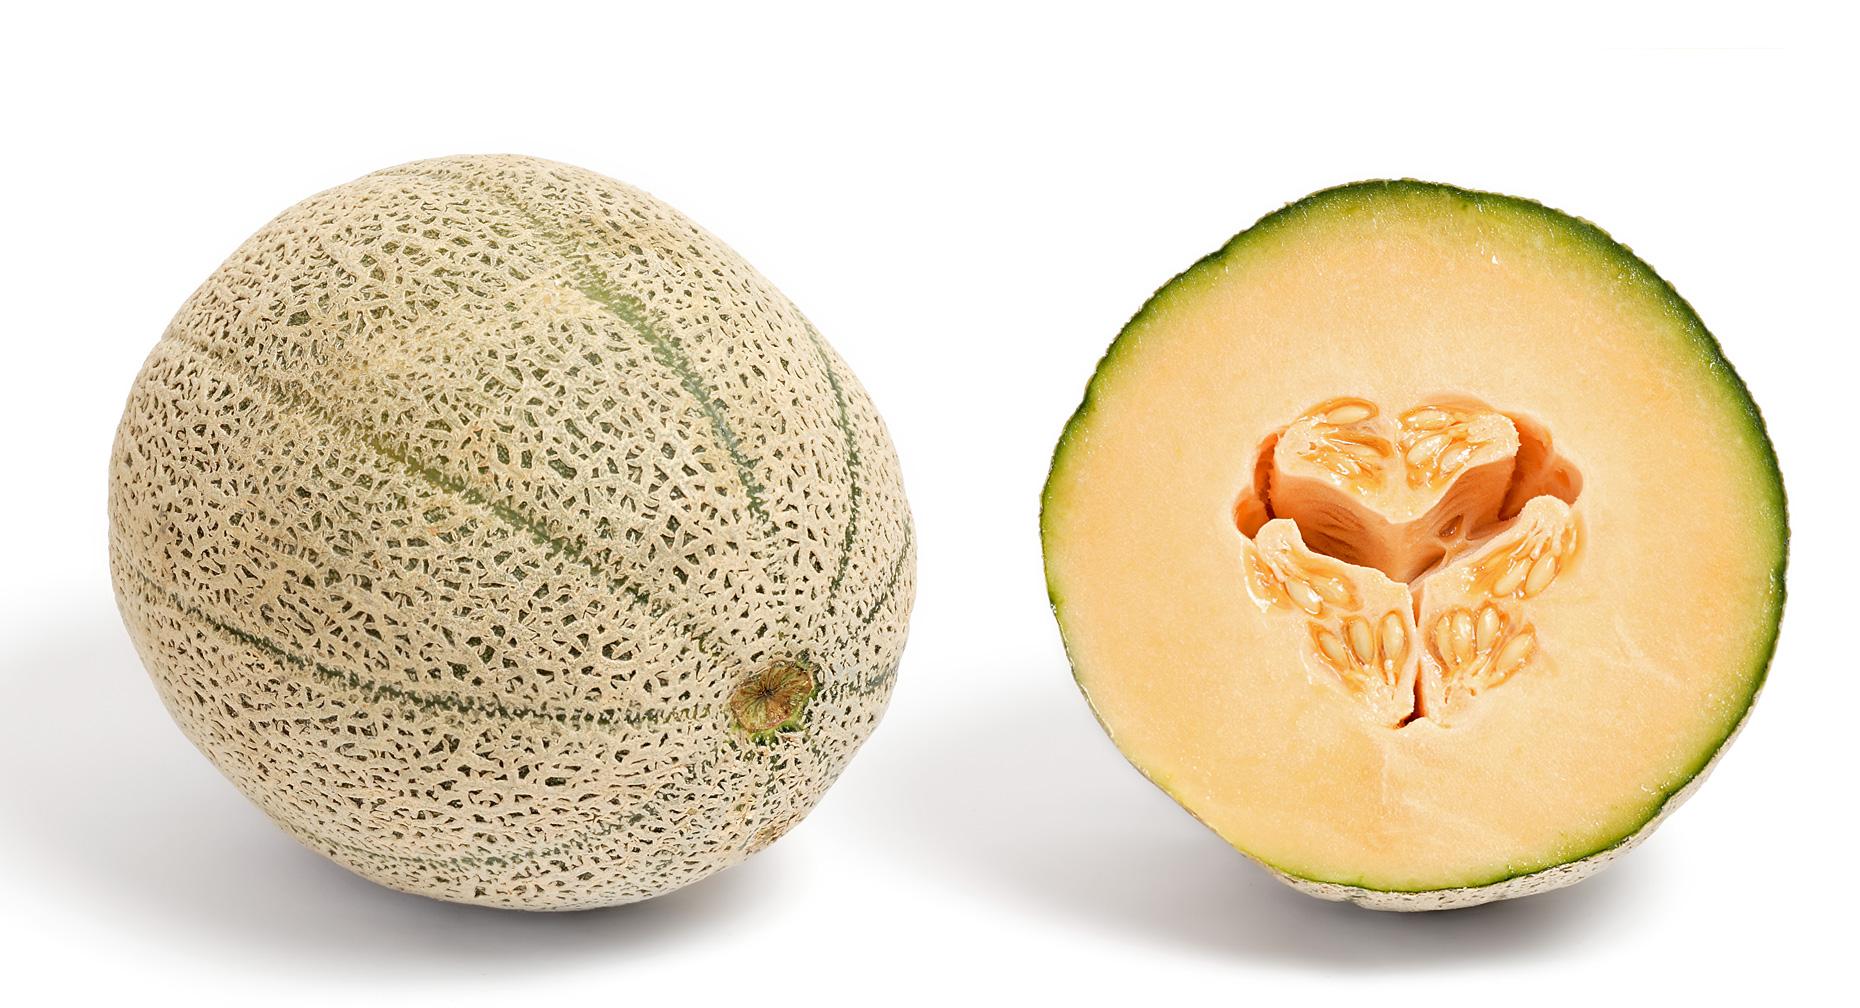 Honeydew melon furit pictures